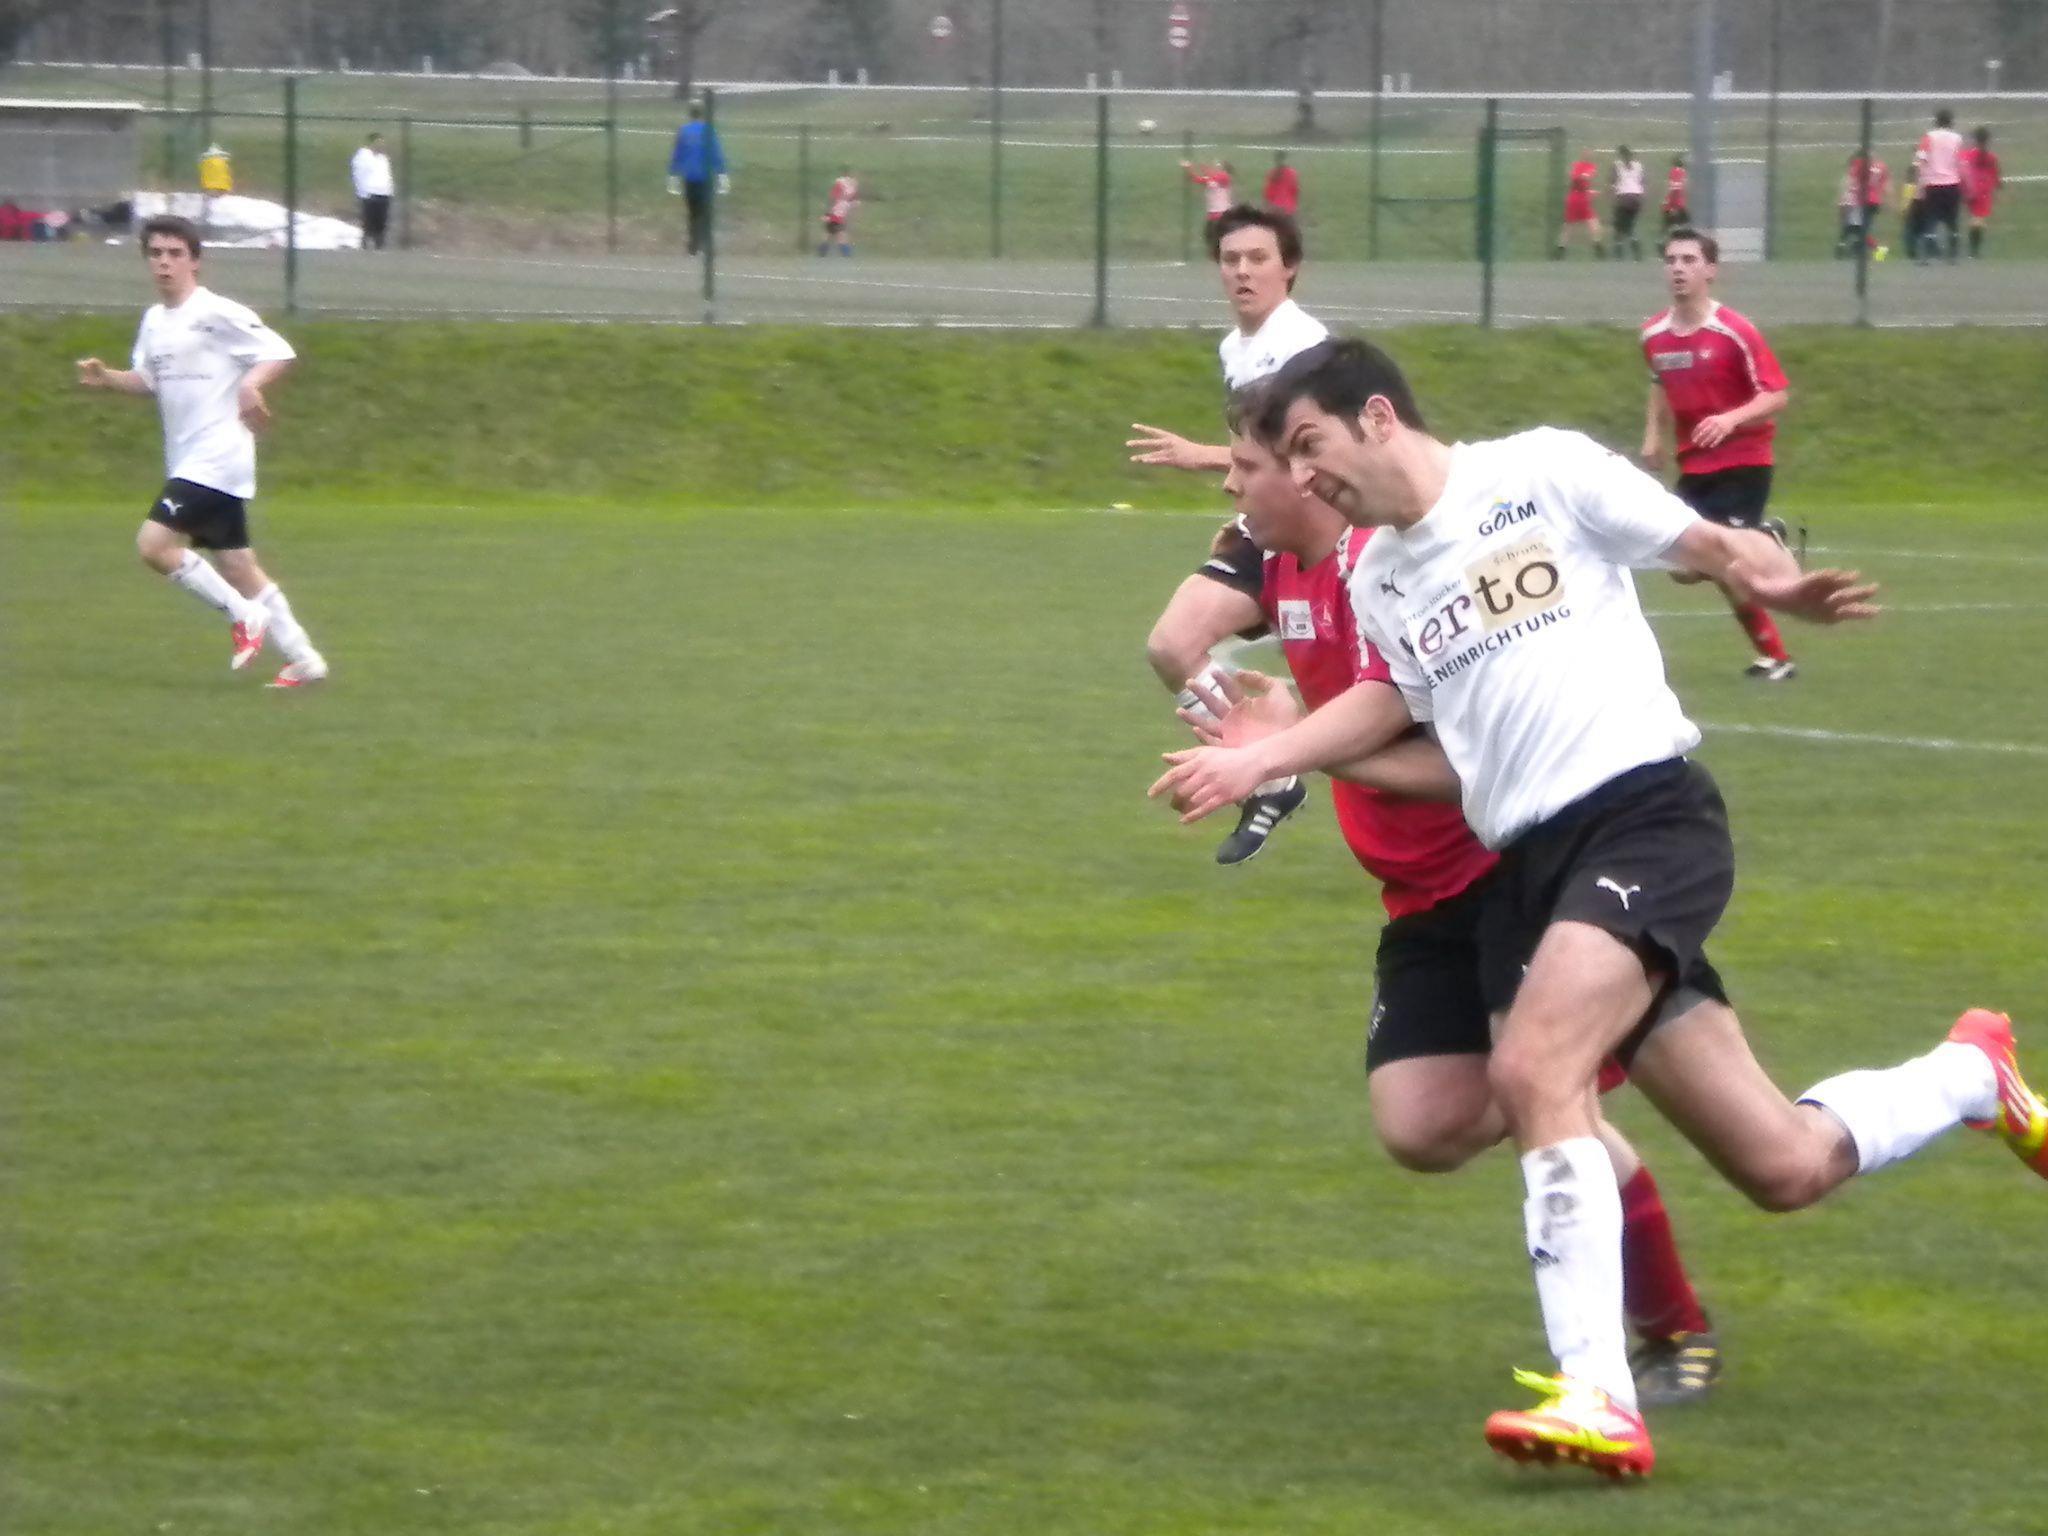 Andreas Engstler erzielte gegen den DSV einen sehenswerten Treffer per Fallrückzieher